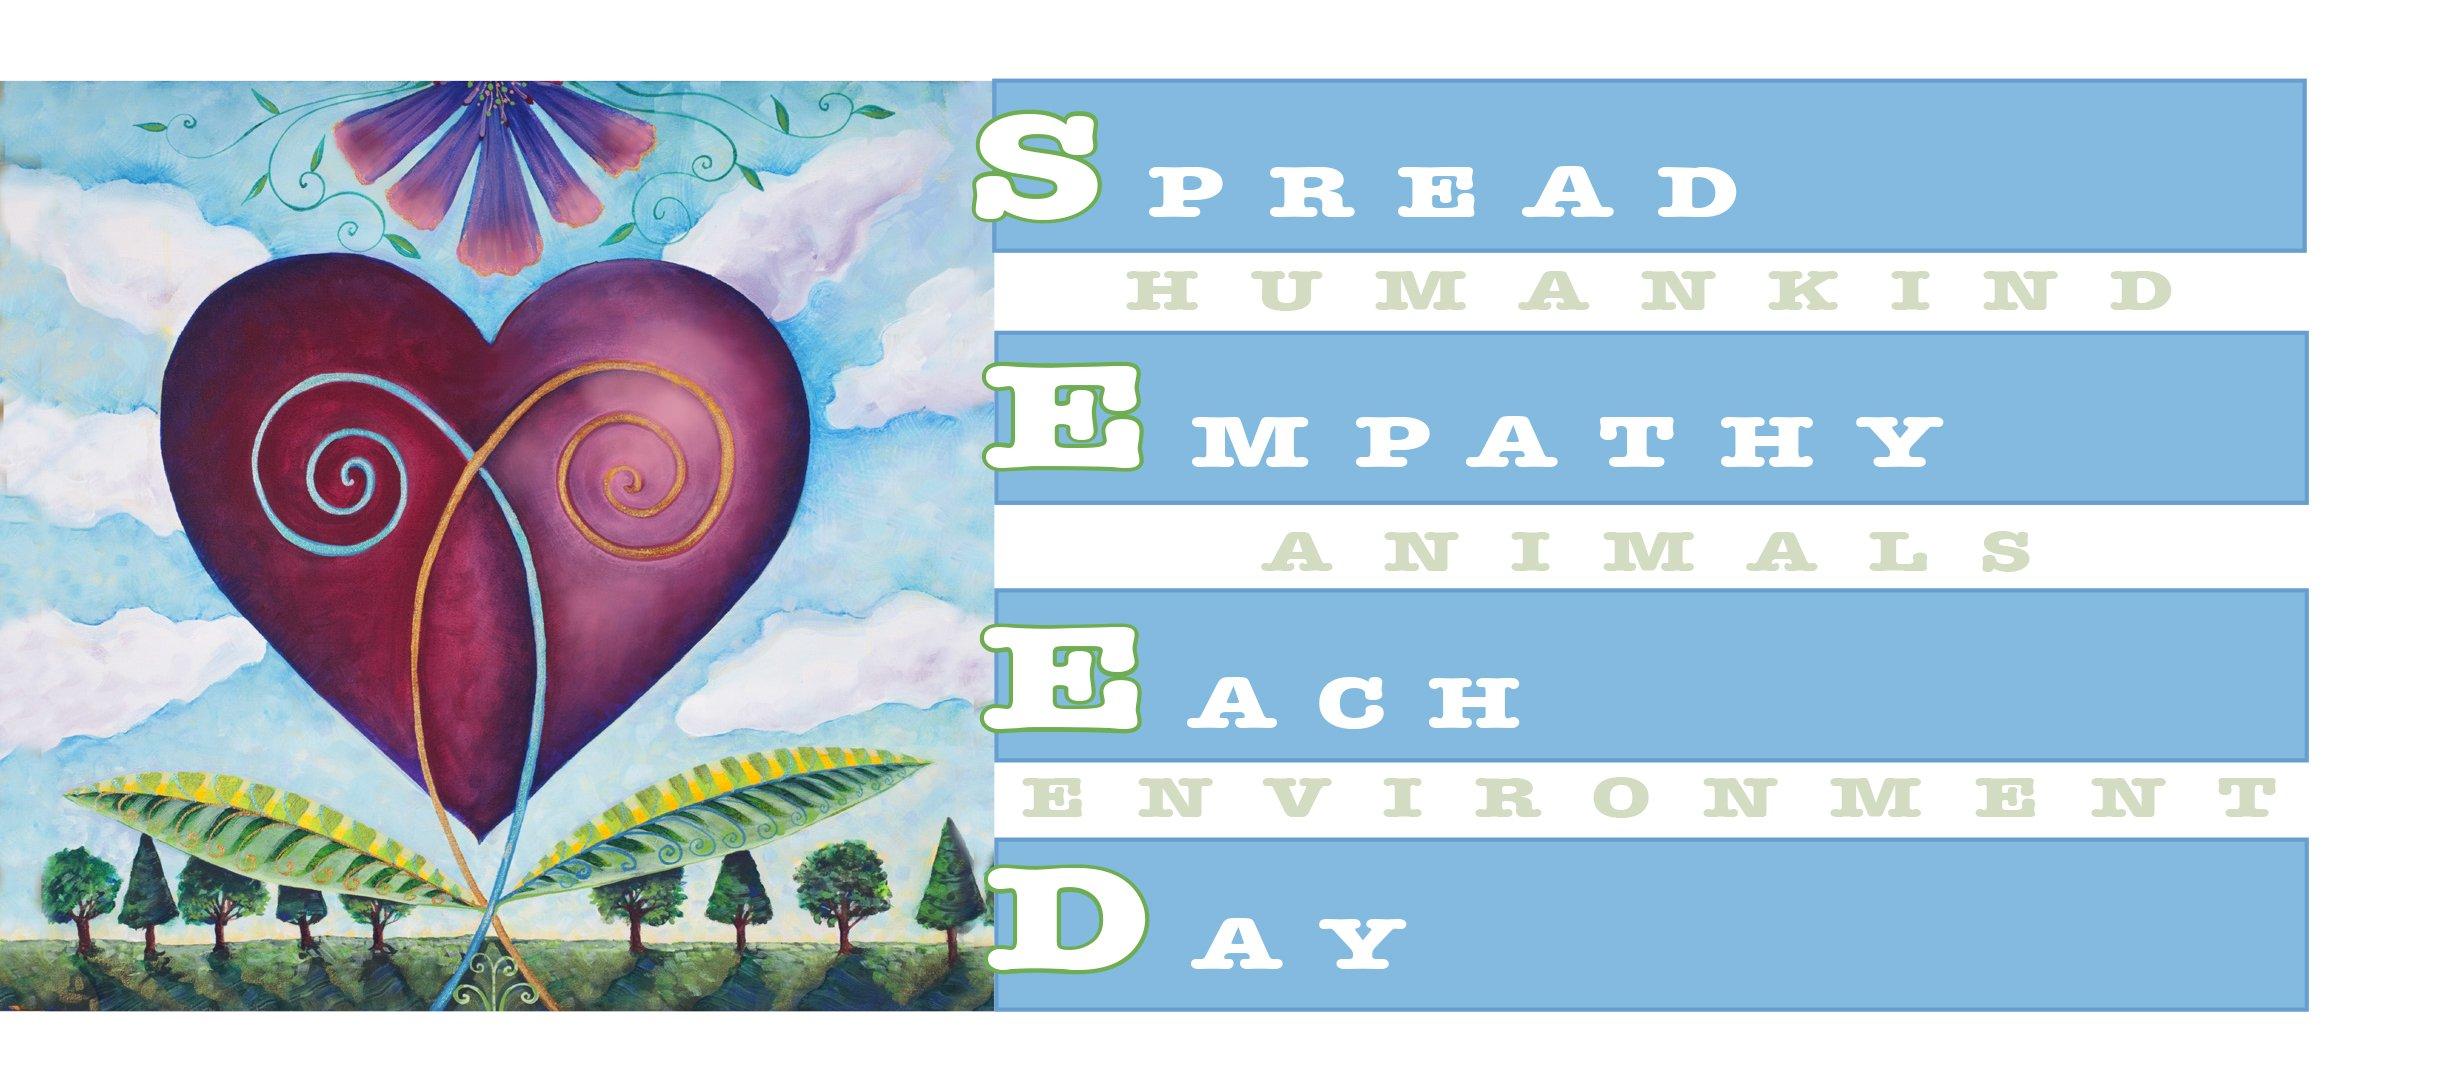 logo for Seed spread empathy each day